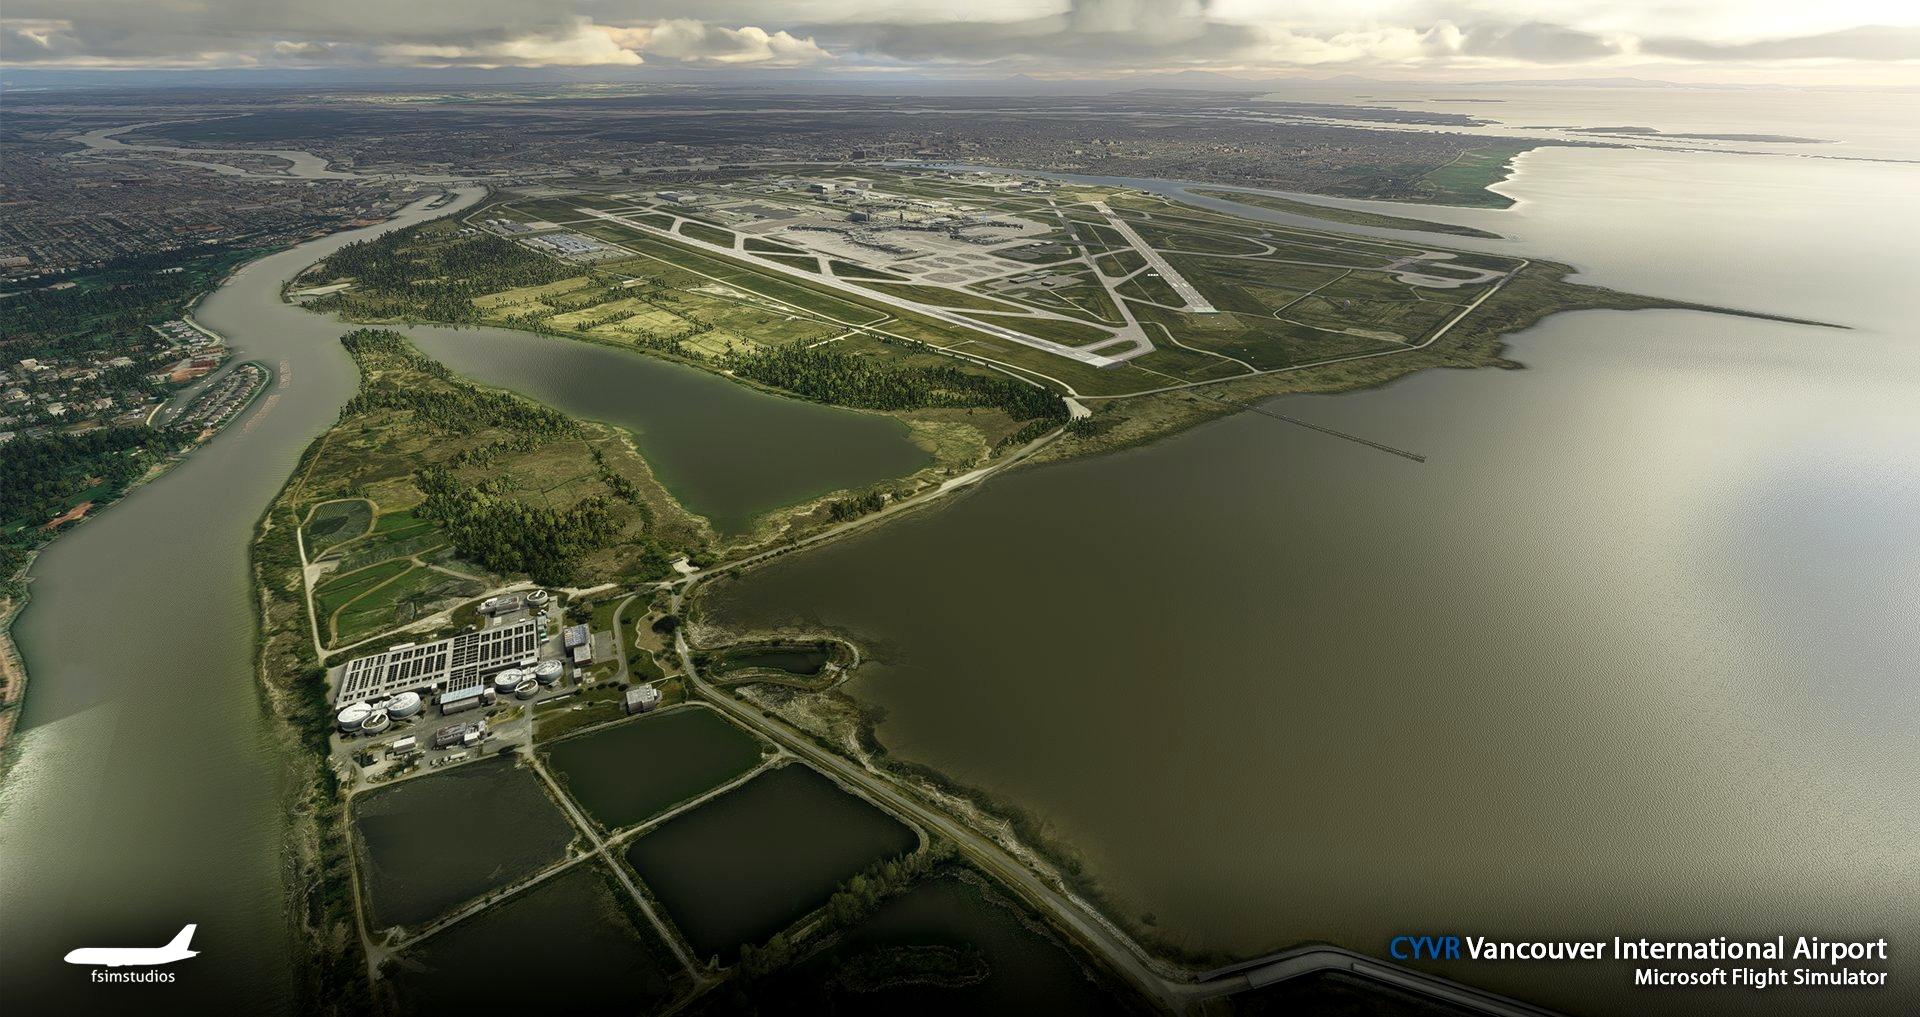 CYVR Vancouver International Airport Microsoft Flight Simulator